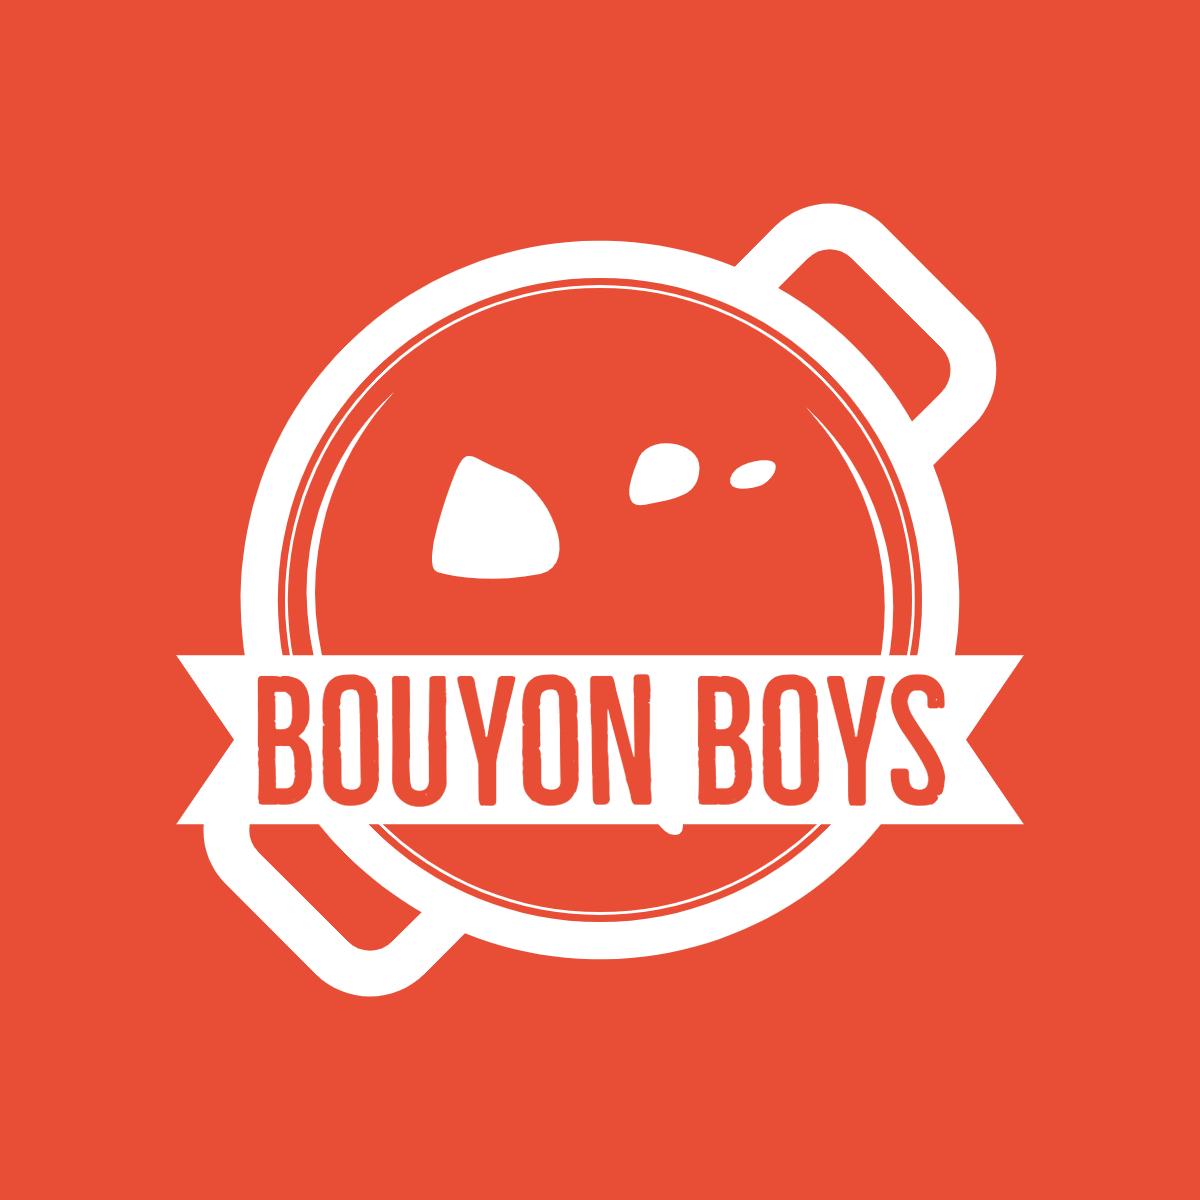 The Bouyon Boys Podcast